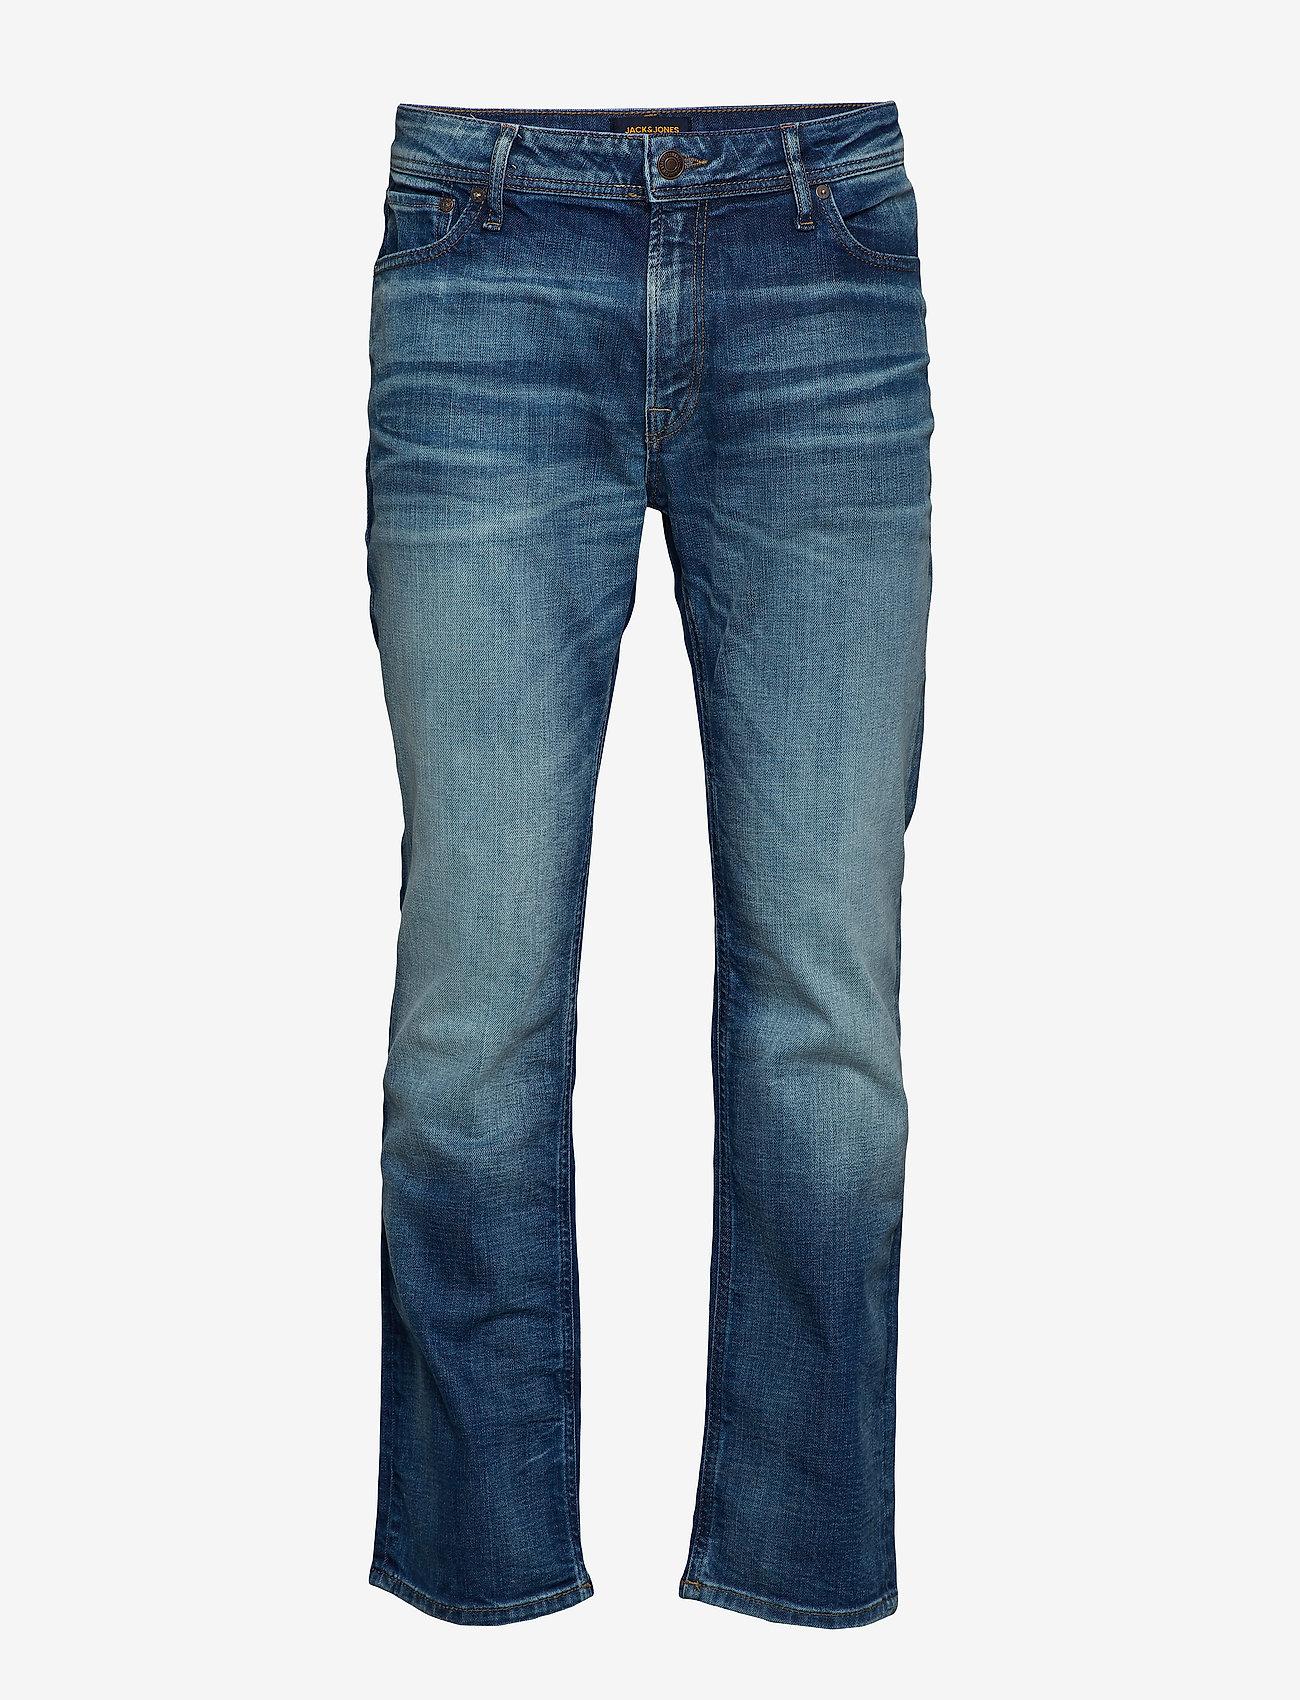 Jack & Jones - JJICLARK JJORIGINAL JOS 178 - regular jeans - blue denim - 0